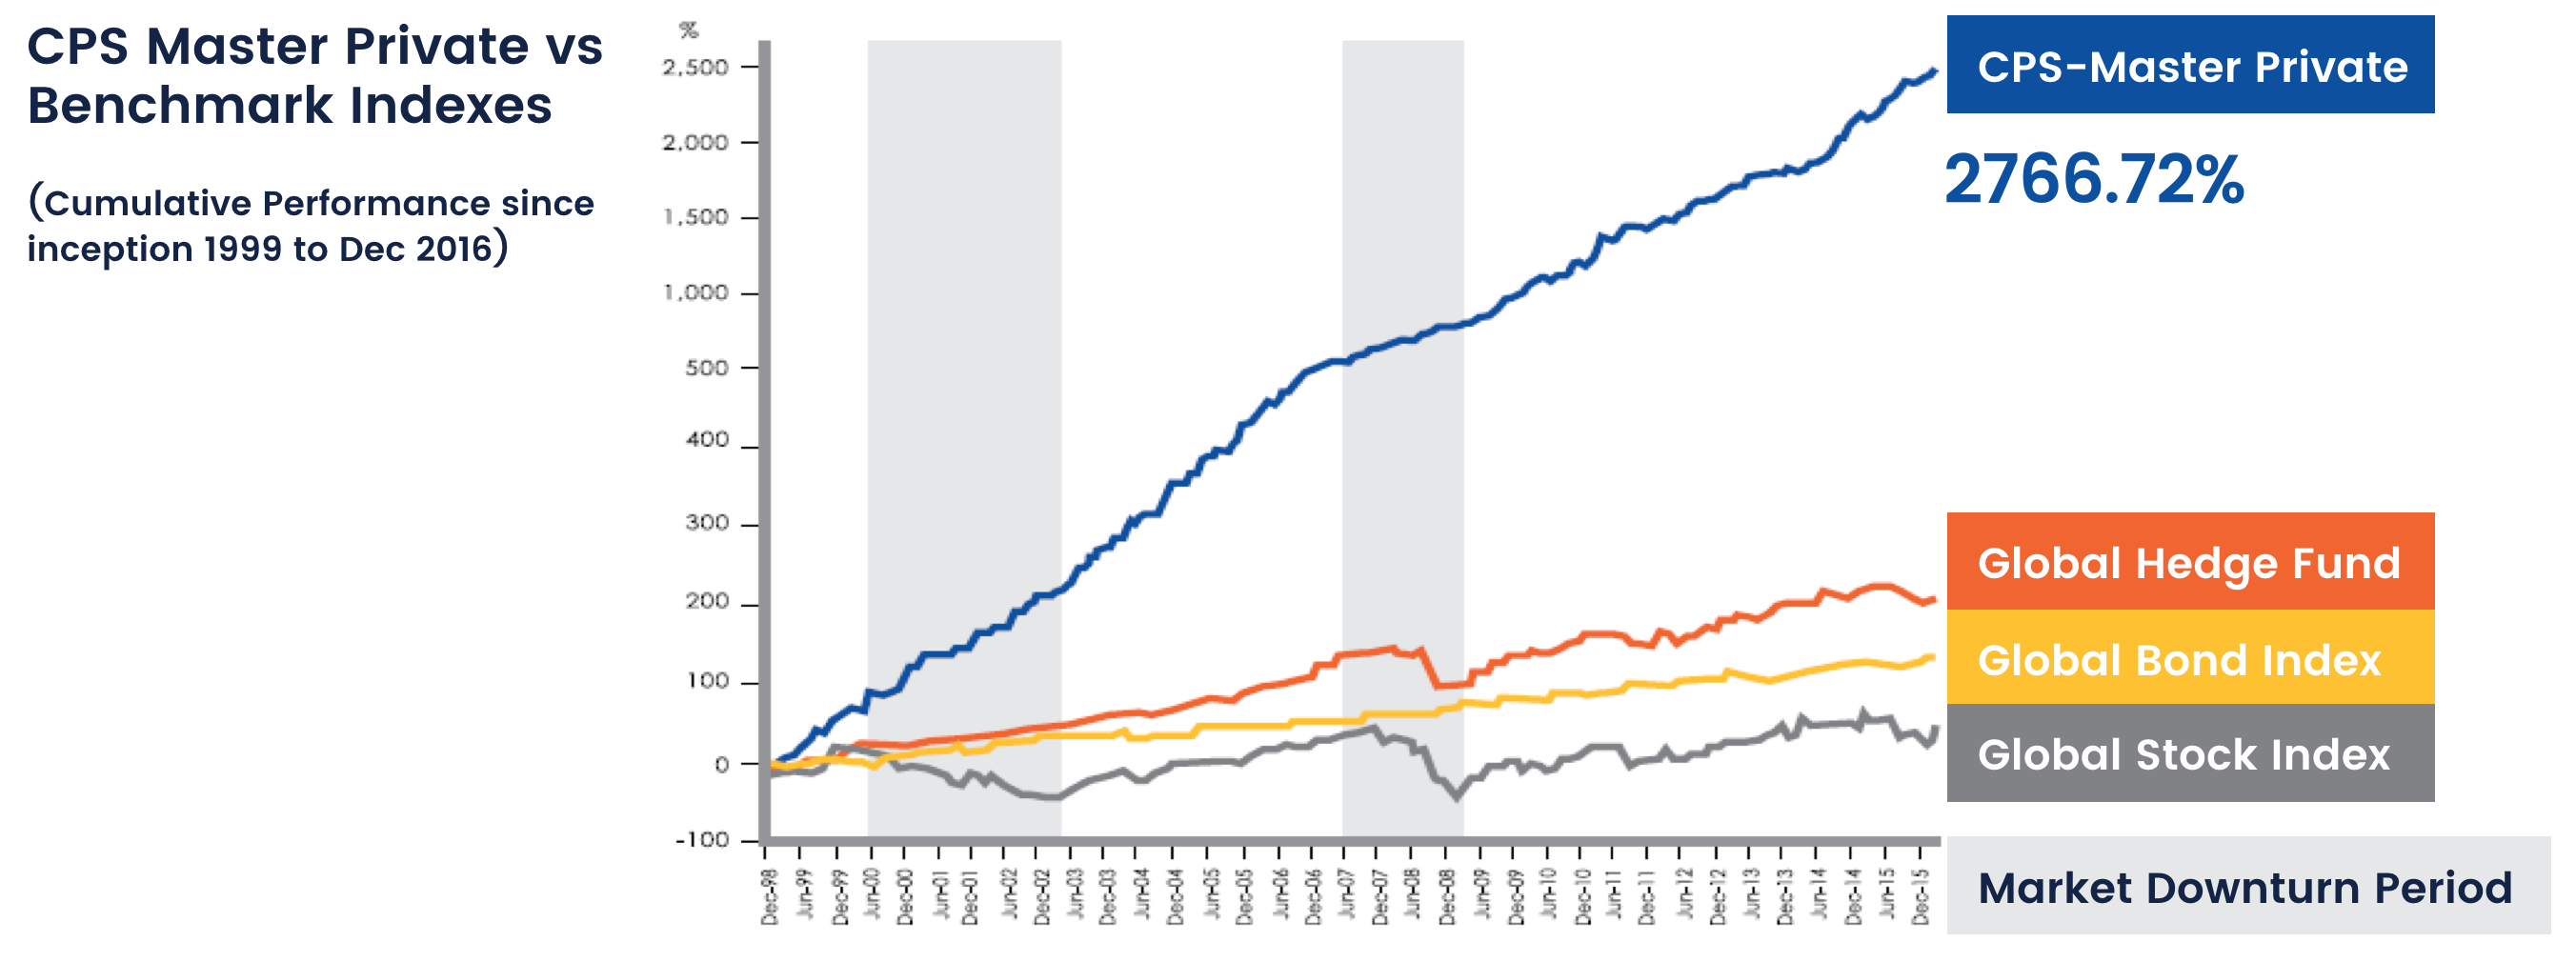 cps-master-cumulative-performance-1999-2016